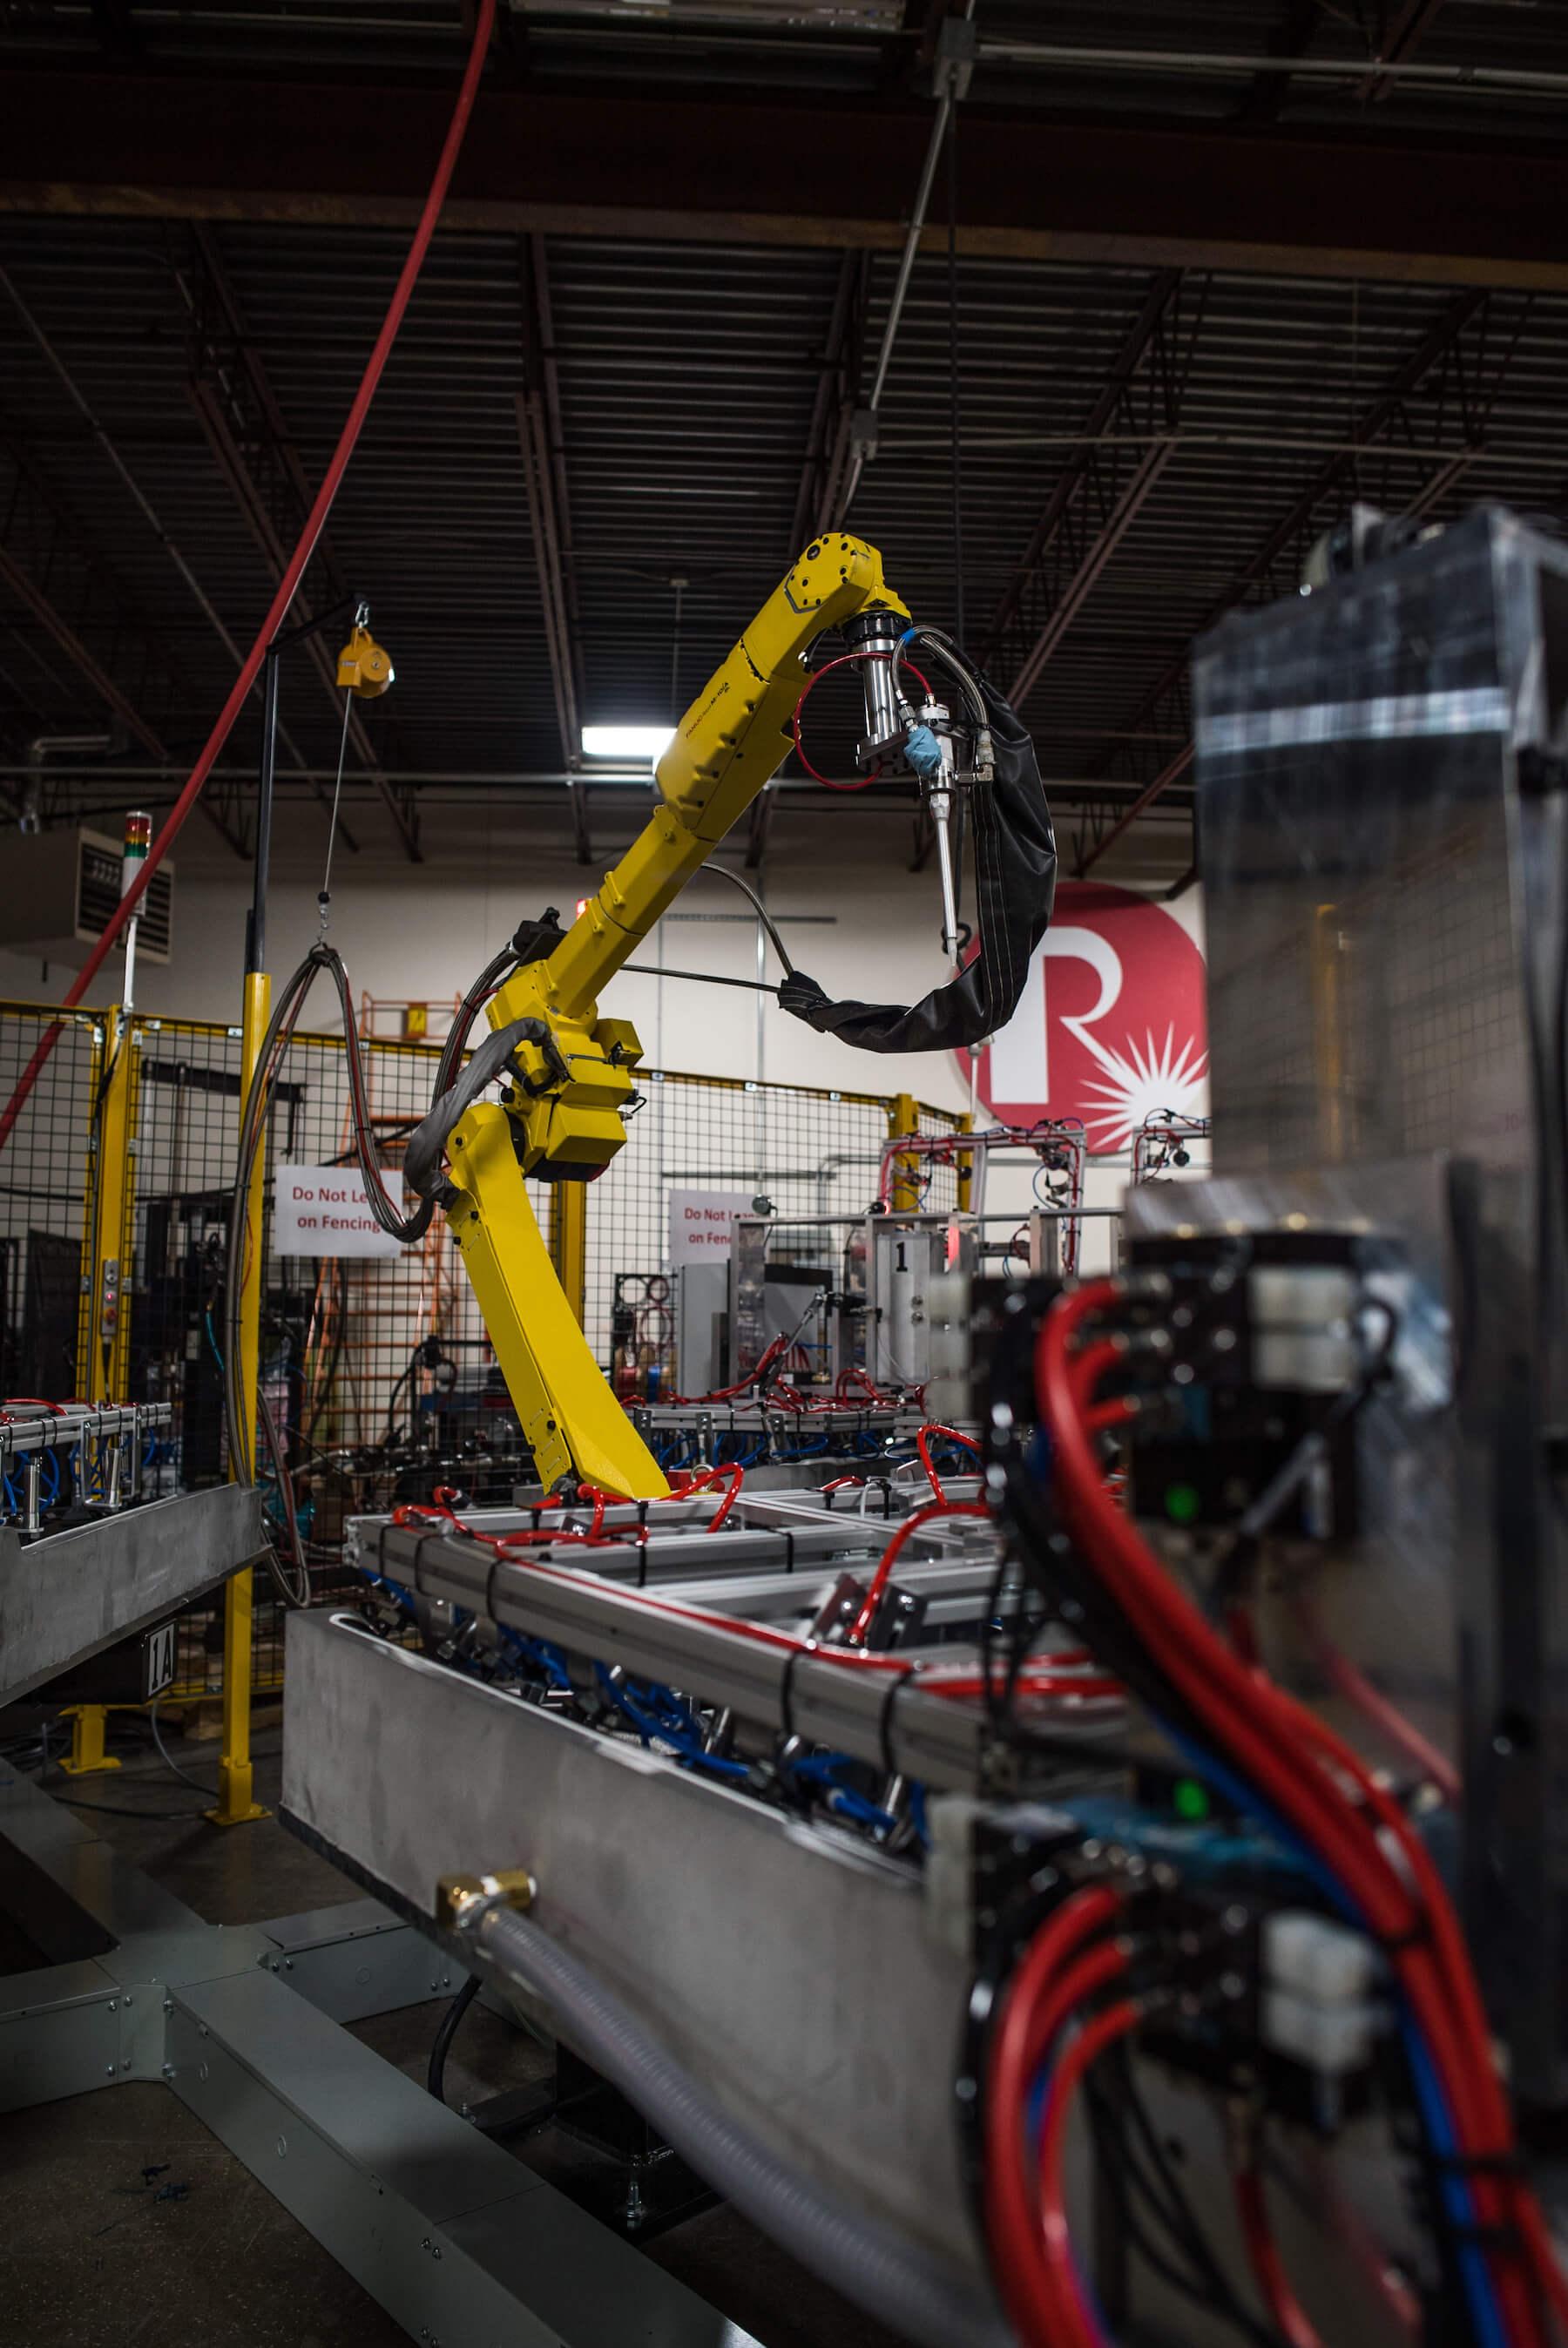 engle-olson-commercial-photography-PRI-Robotics-15.jpg